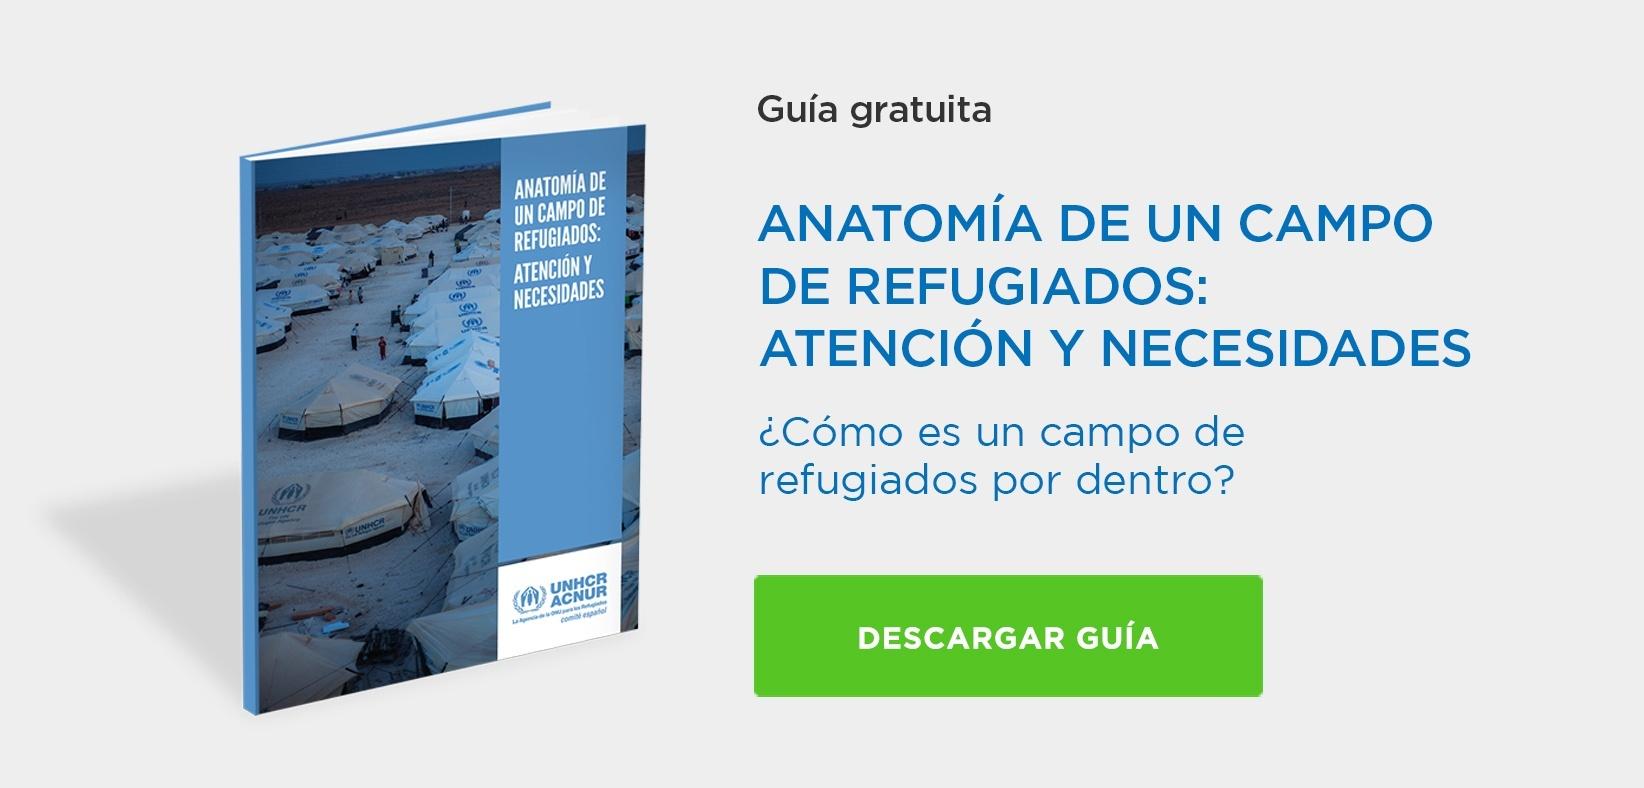 Descarga guía Anatomía de un campo de refugiados